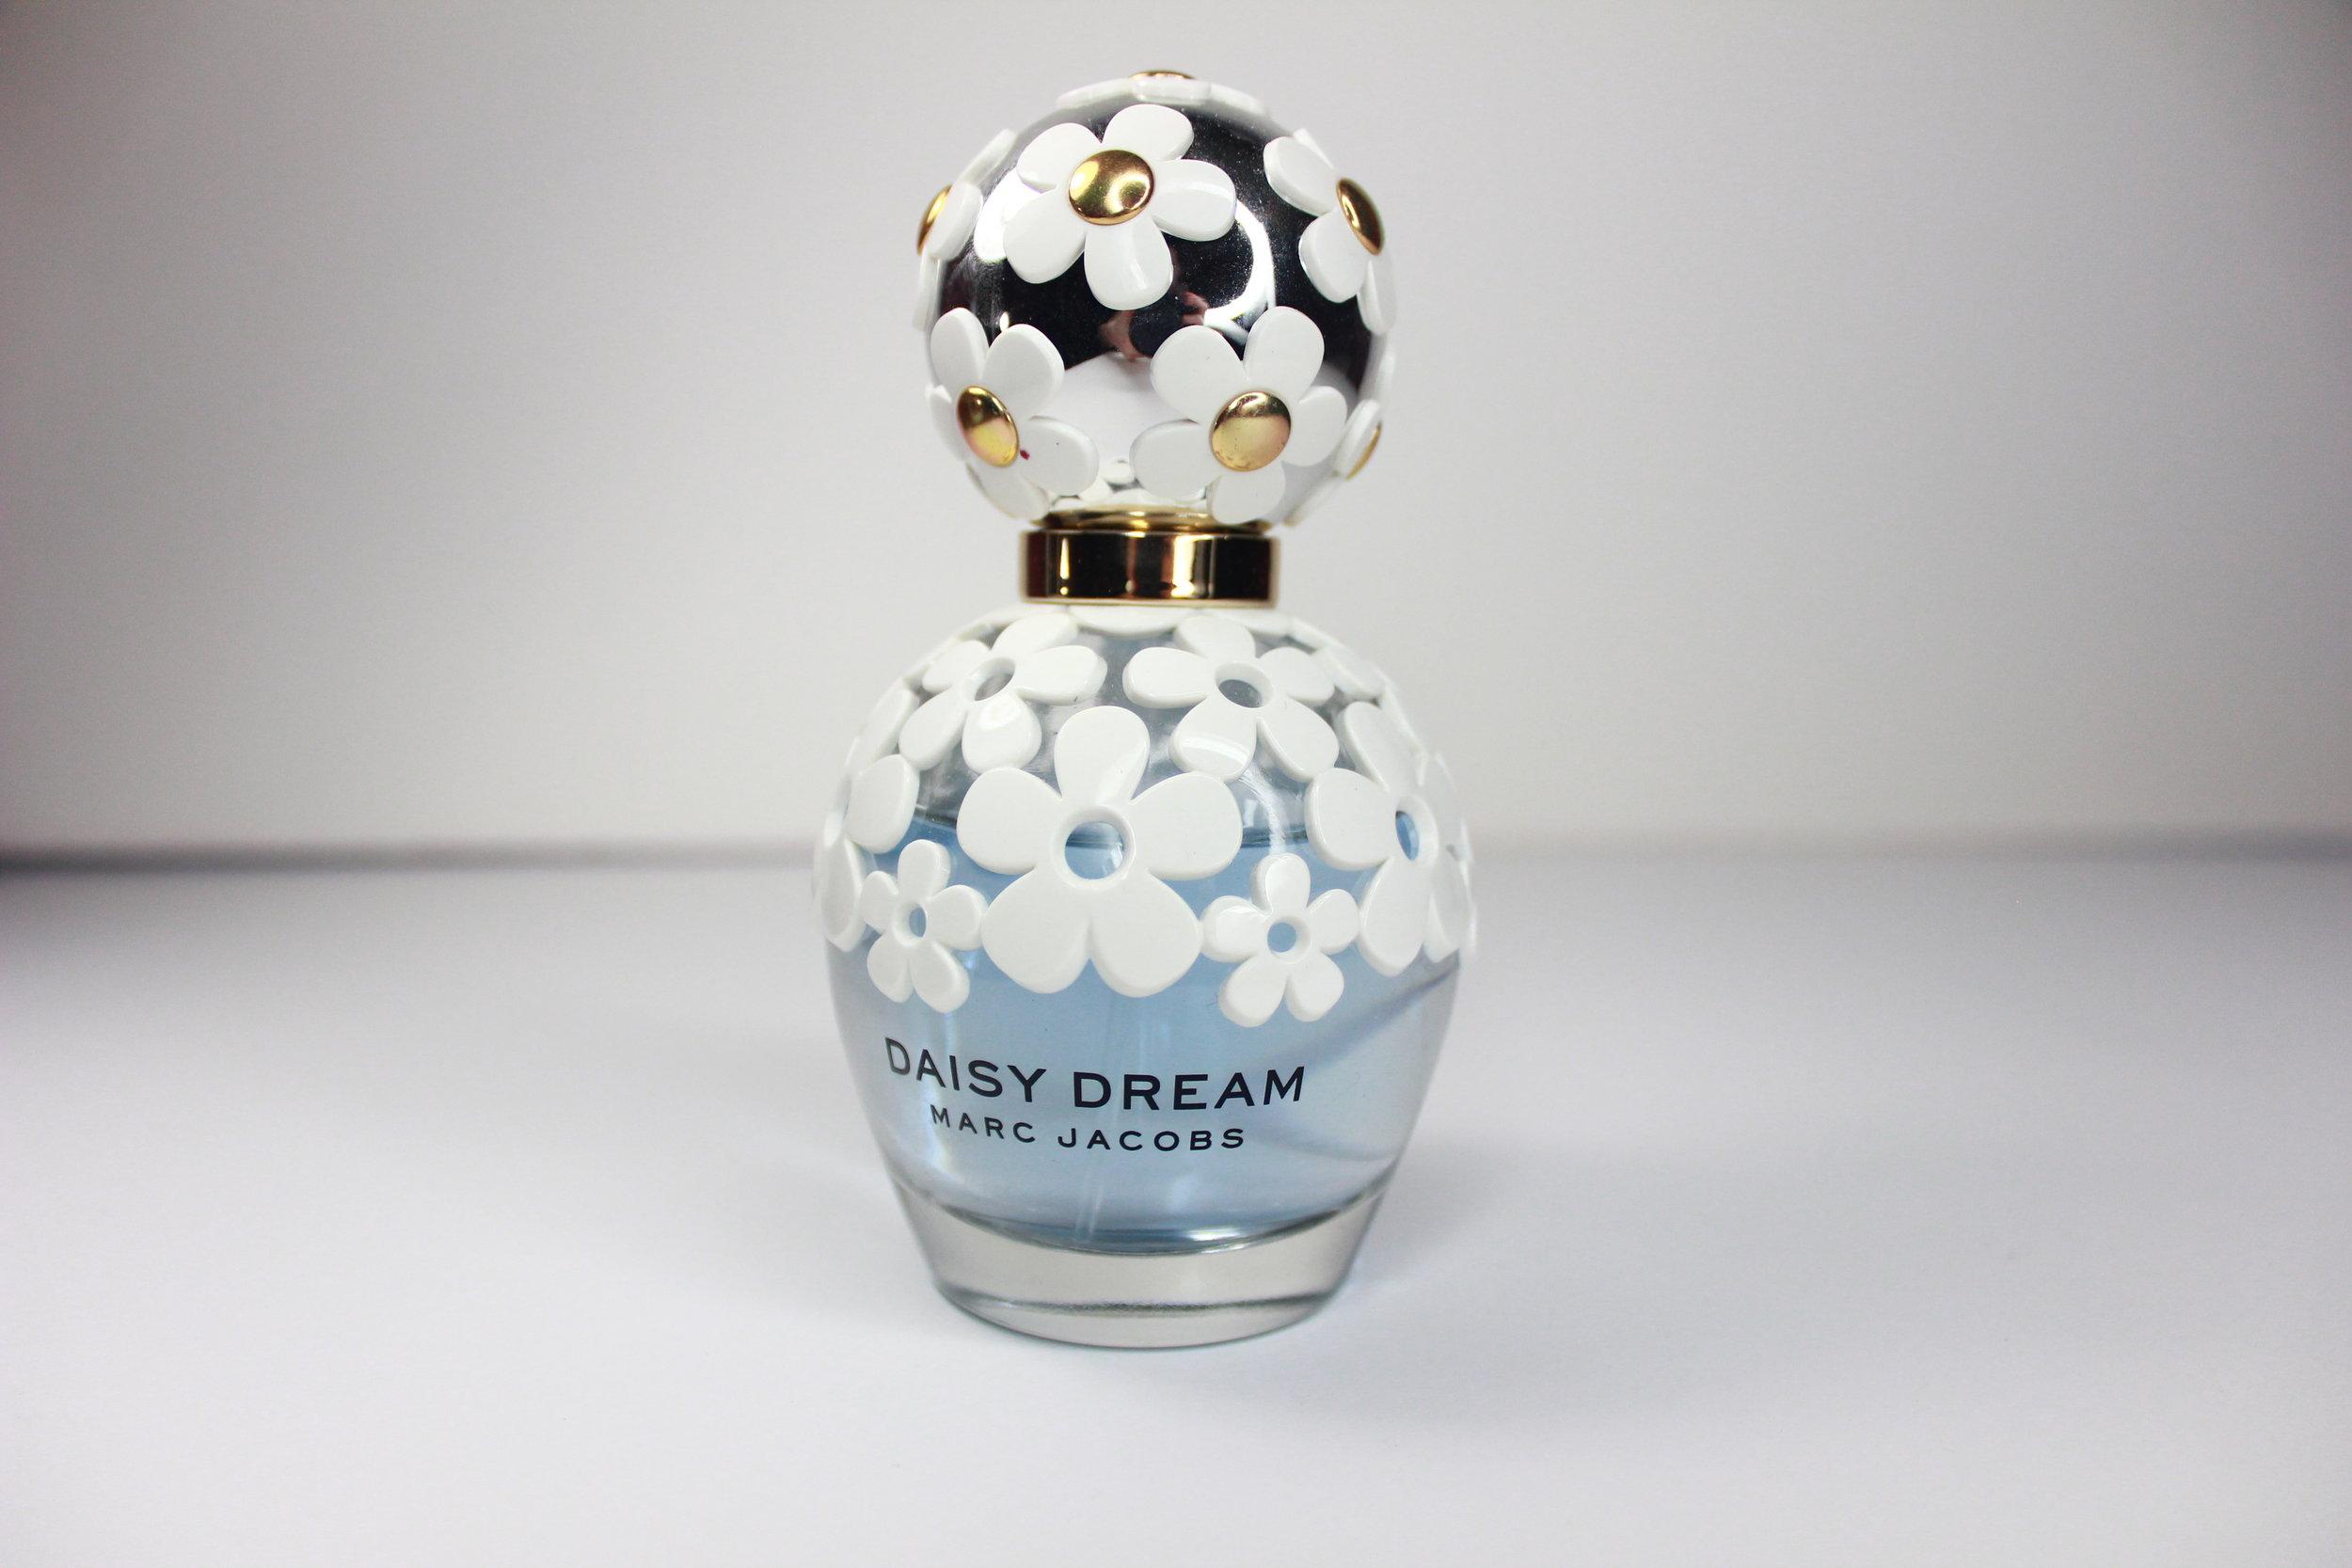 Mac Jacobs Daisy Dream Perfume